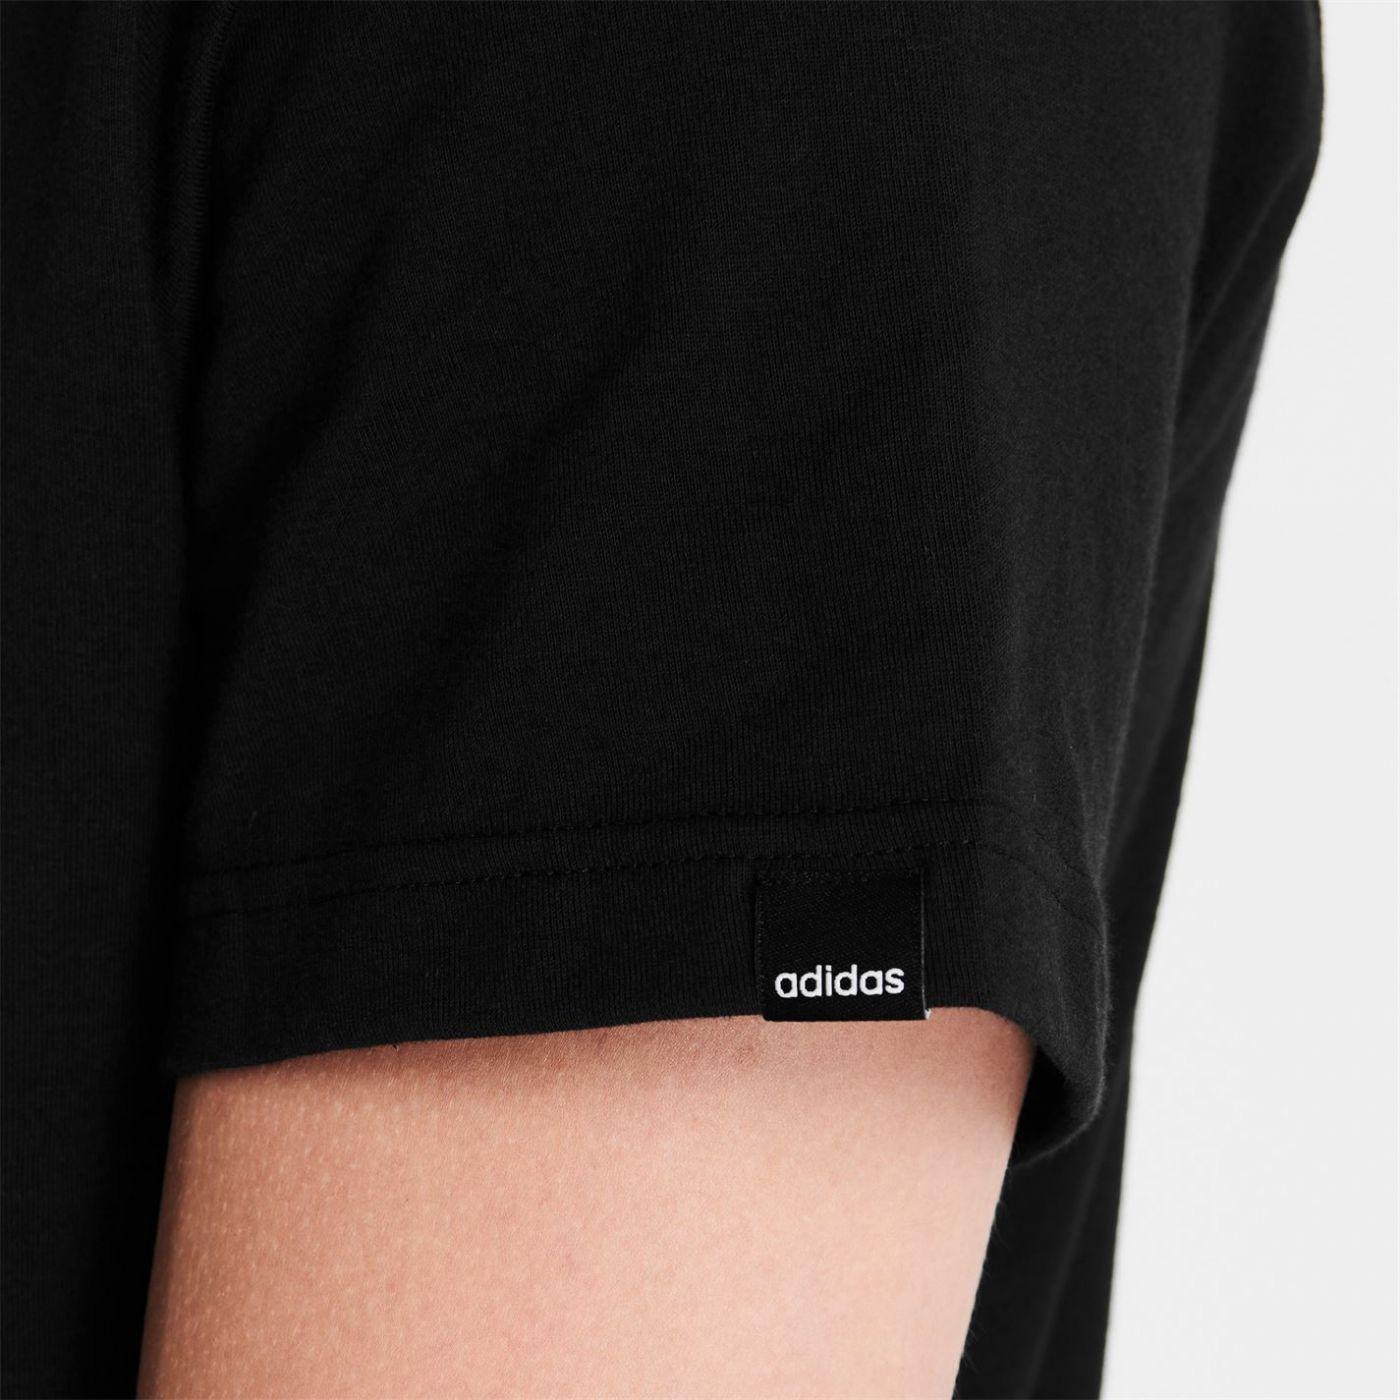 Adidas Box 03 Qt T-shirt Mens